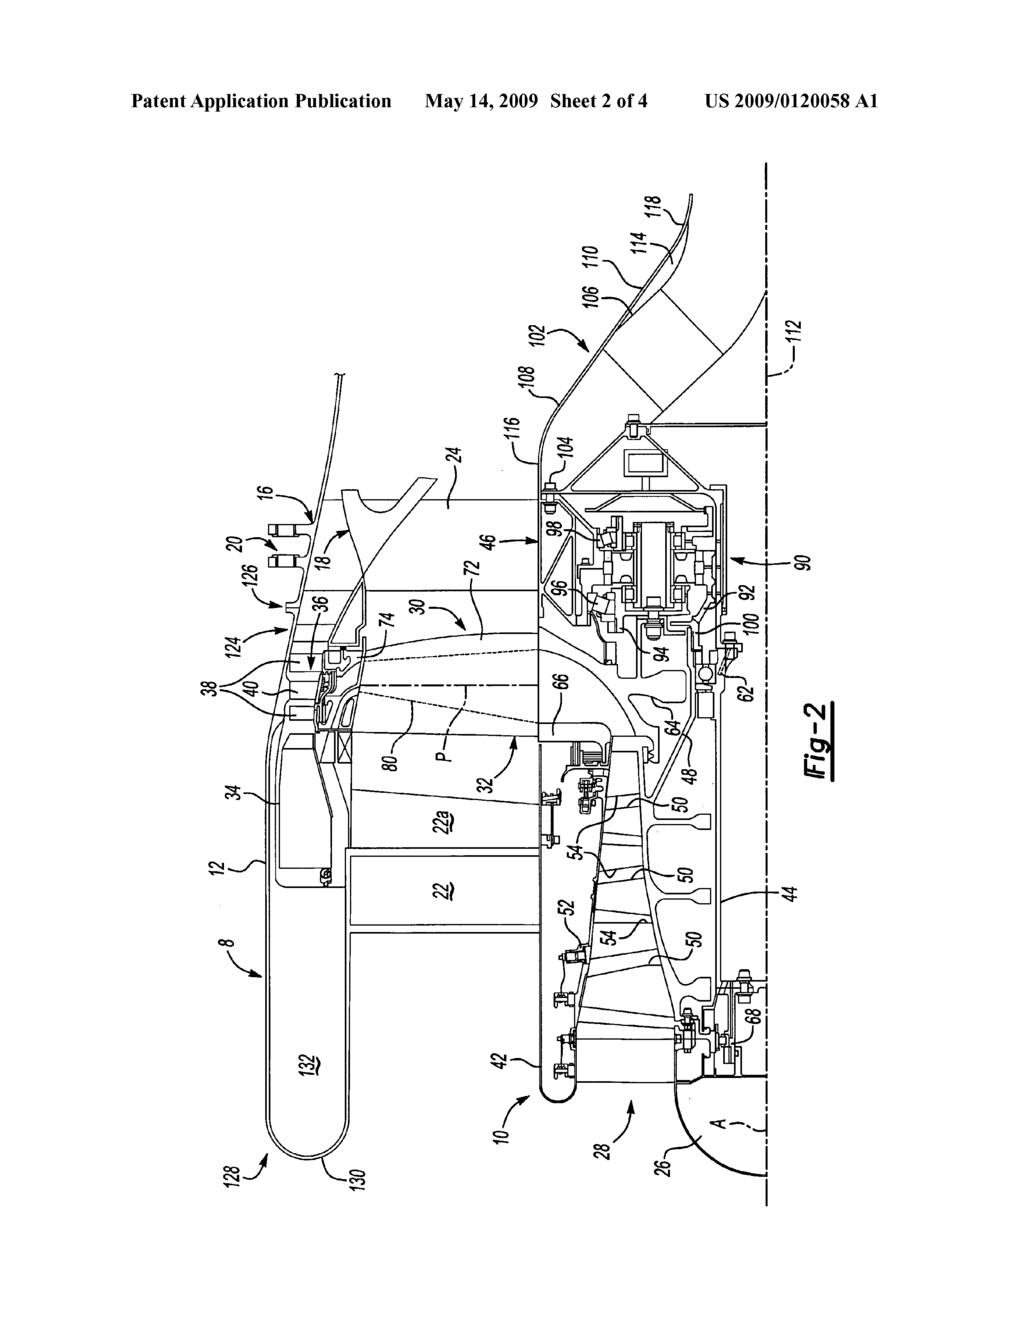 Wiring Diagram Daihatsu Rocky Free For You Auto Sirion